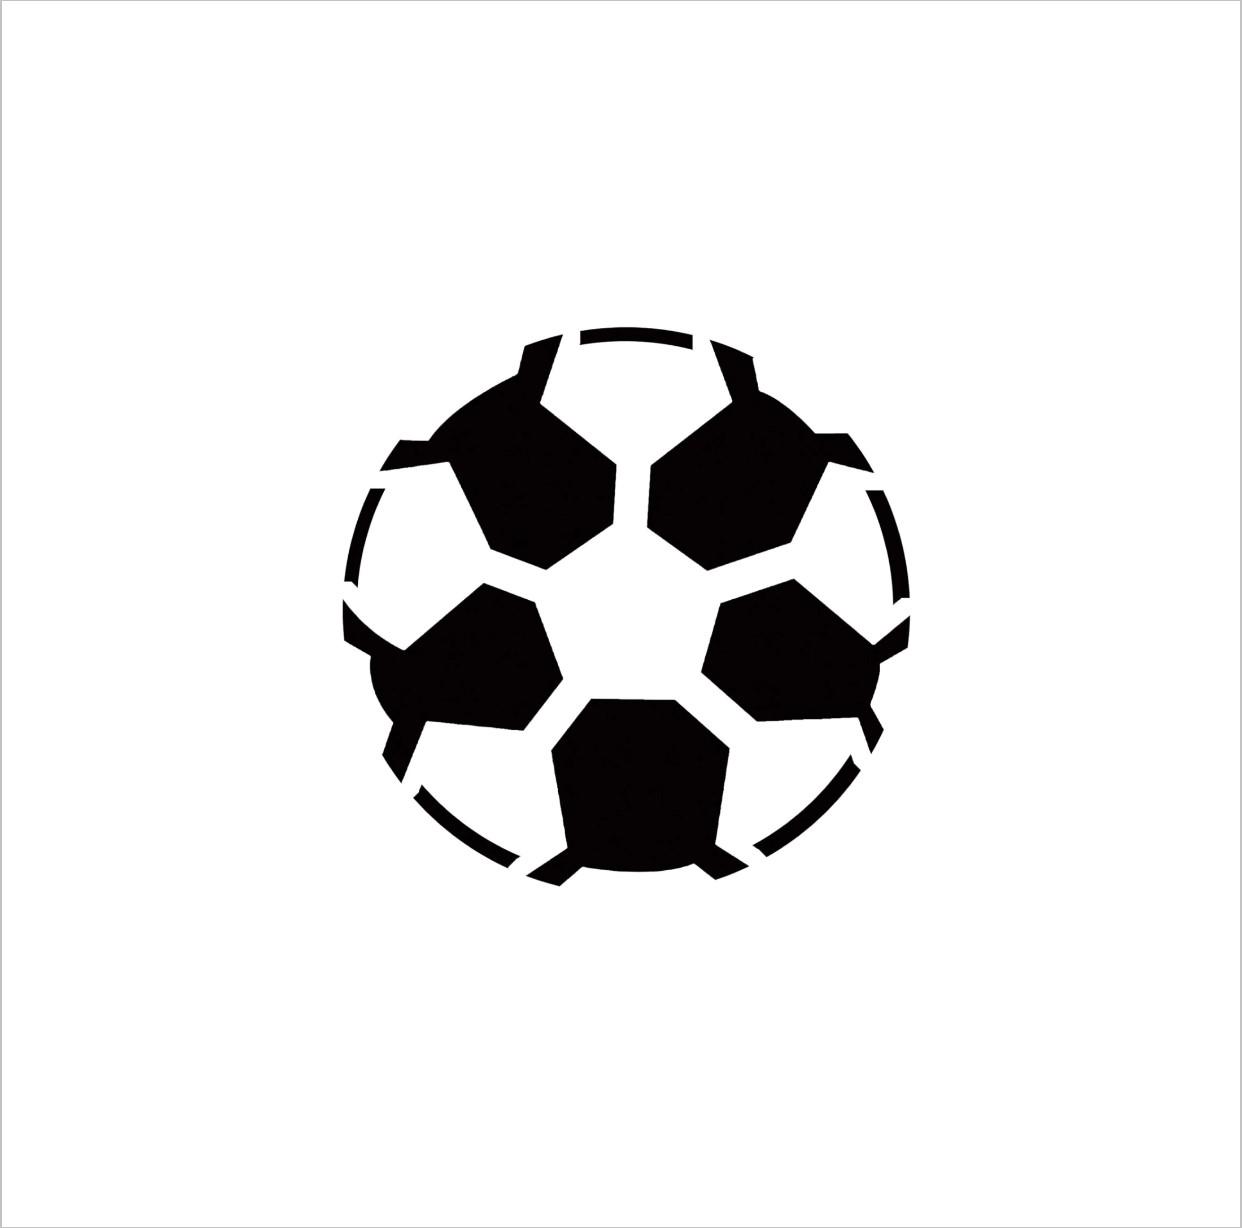 Soccer Ball Professional Stencil Insert (small)